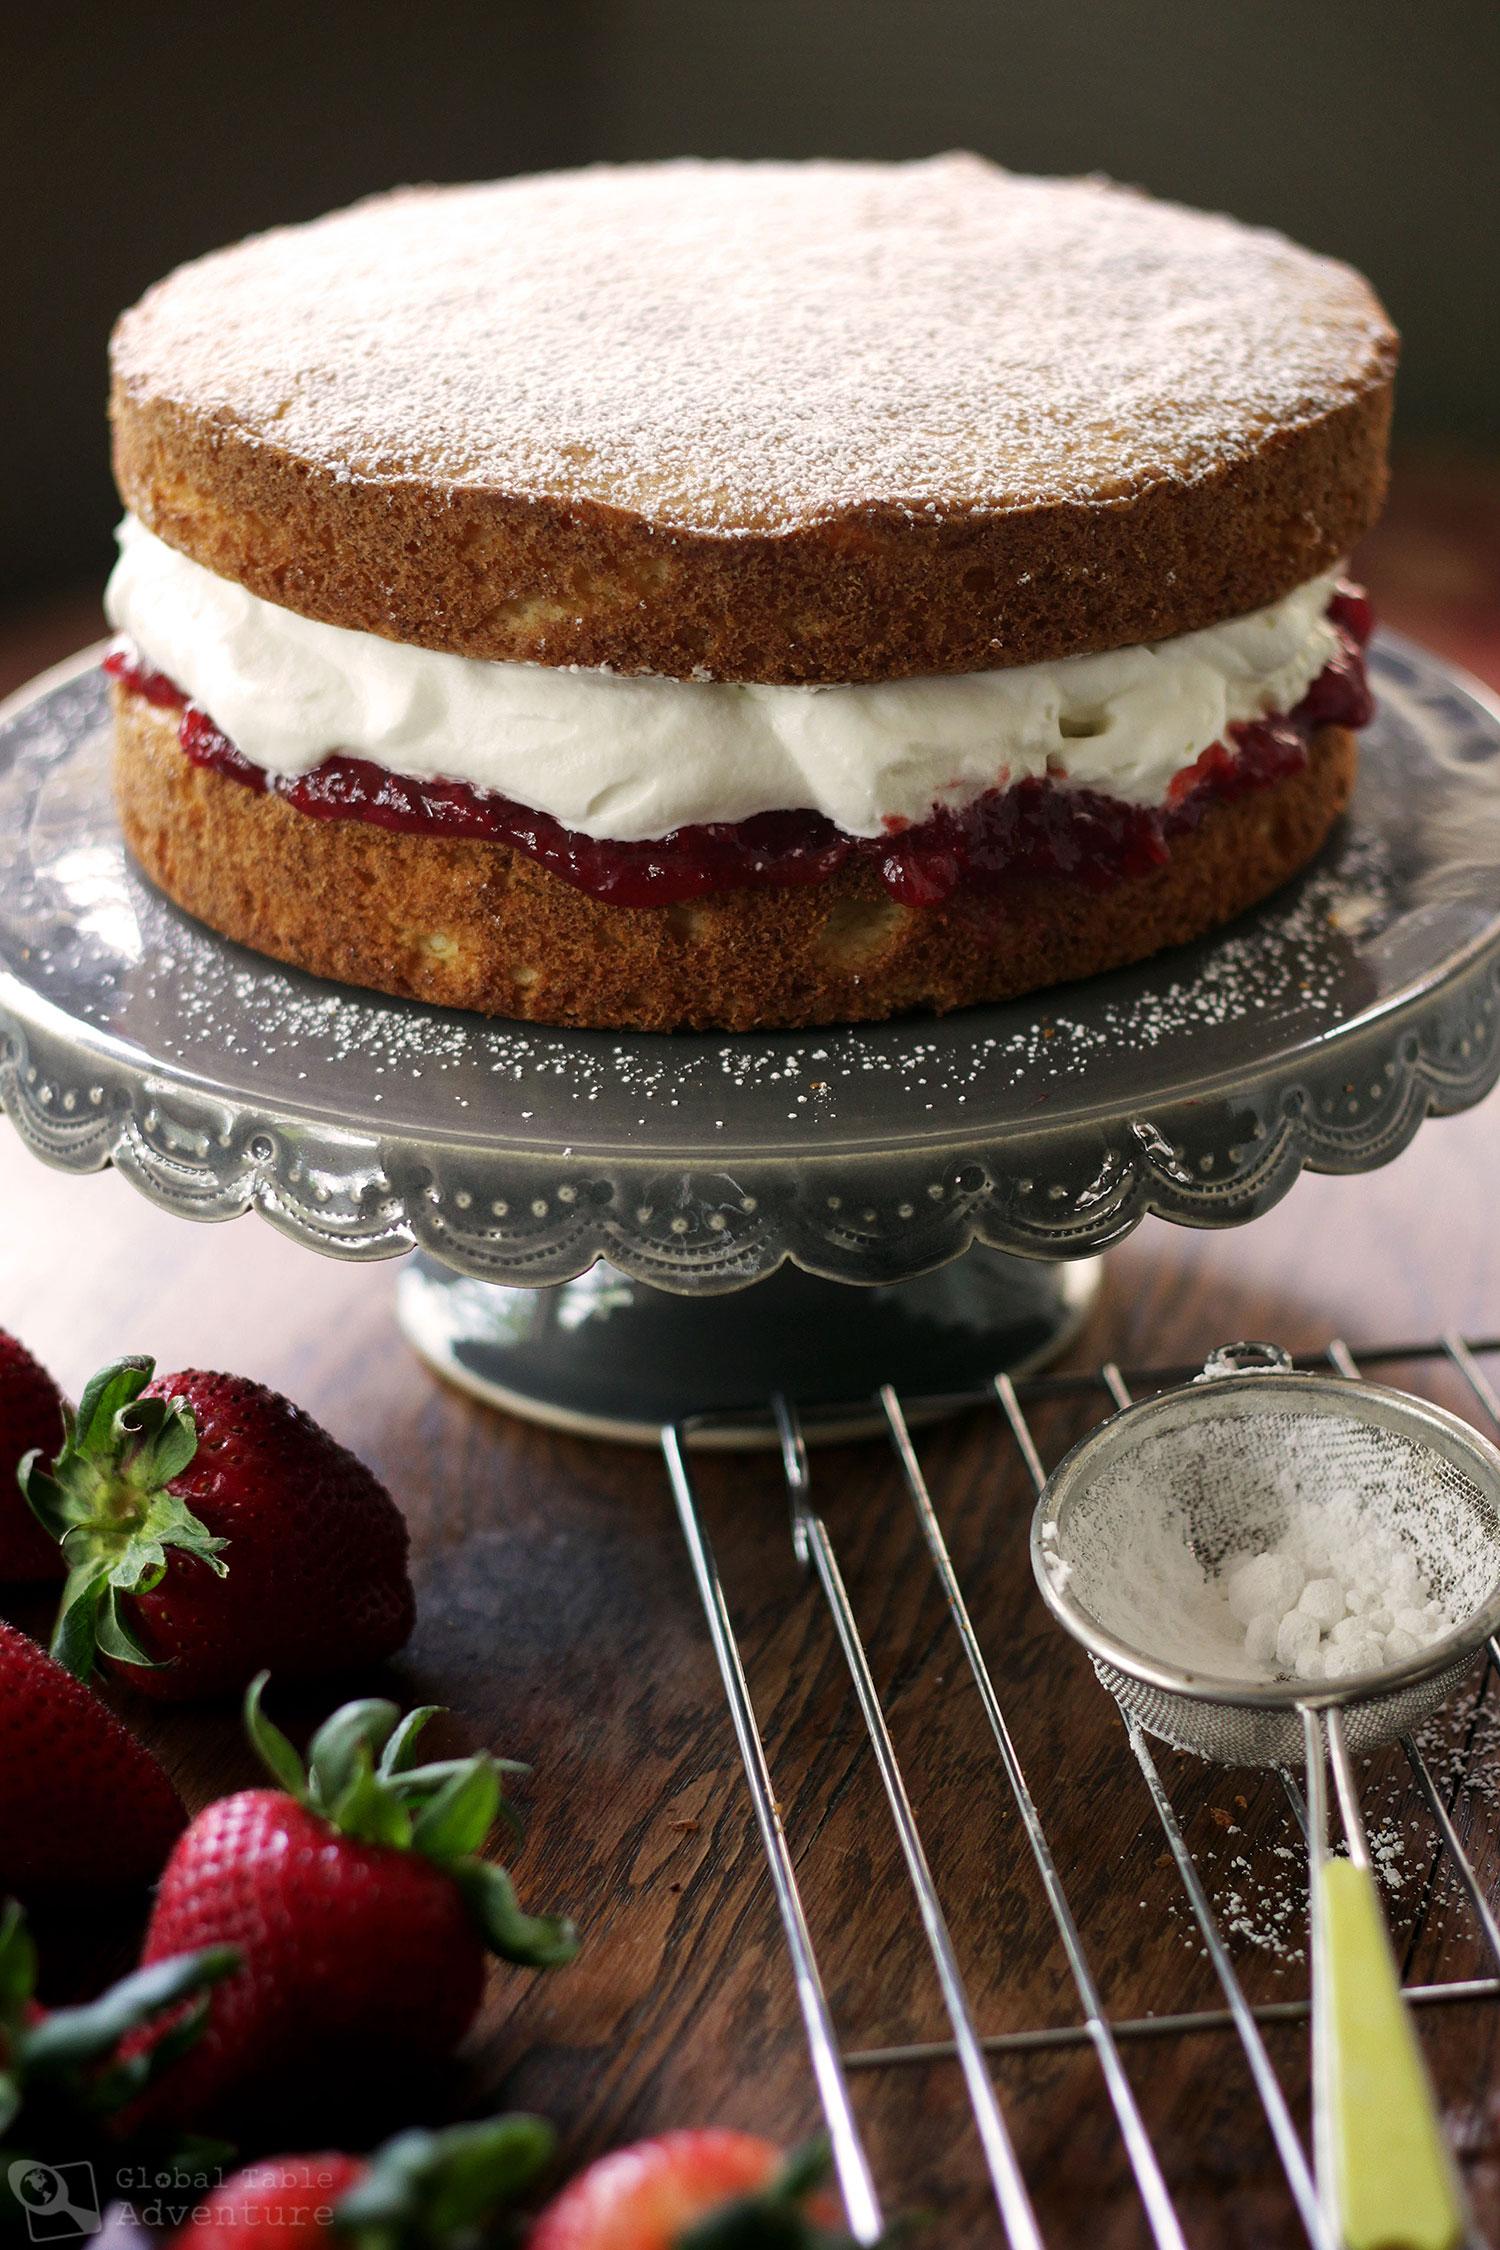 Sponge cake recipe 5 star